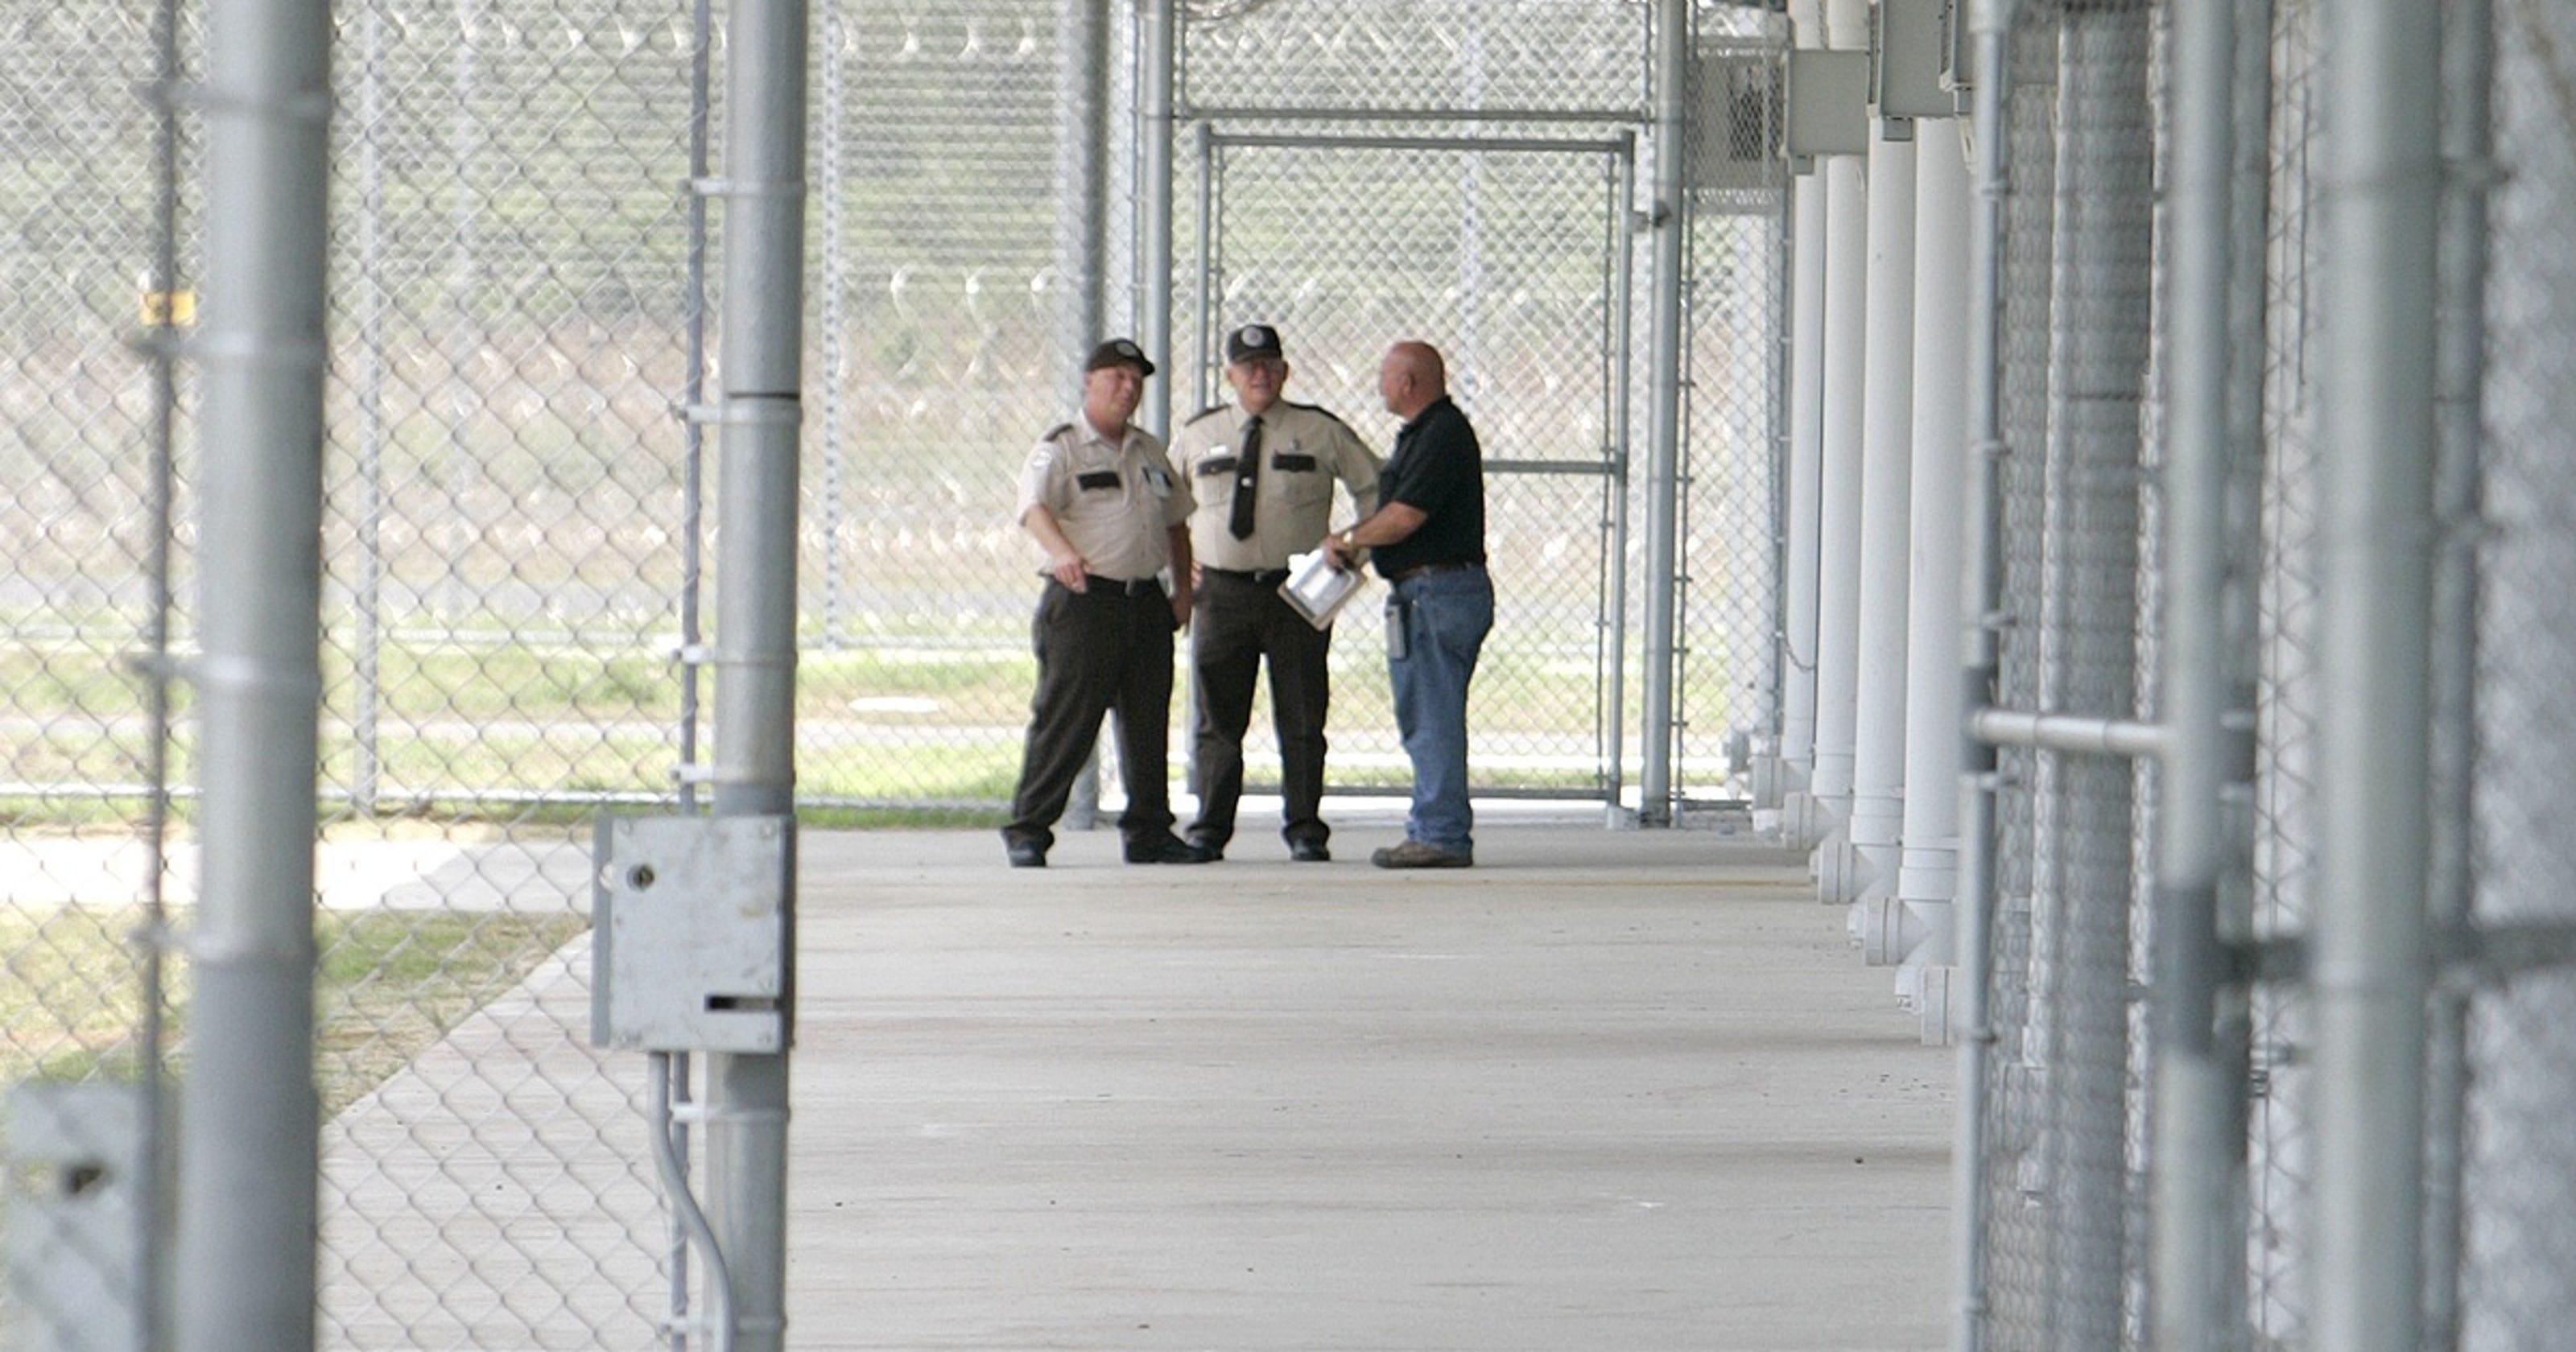 Hundreds of prisoners riot in Franklin County